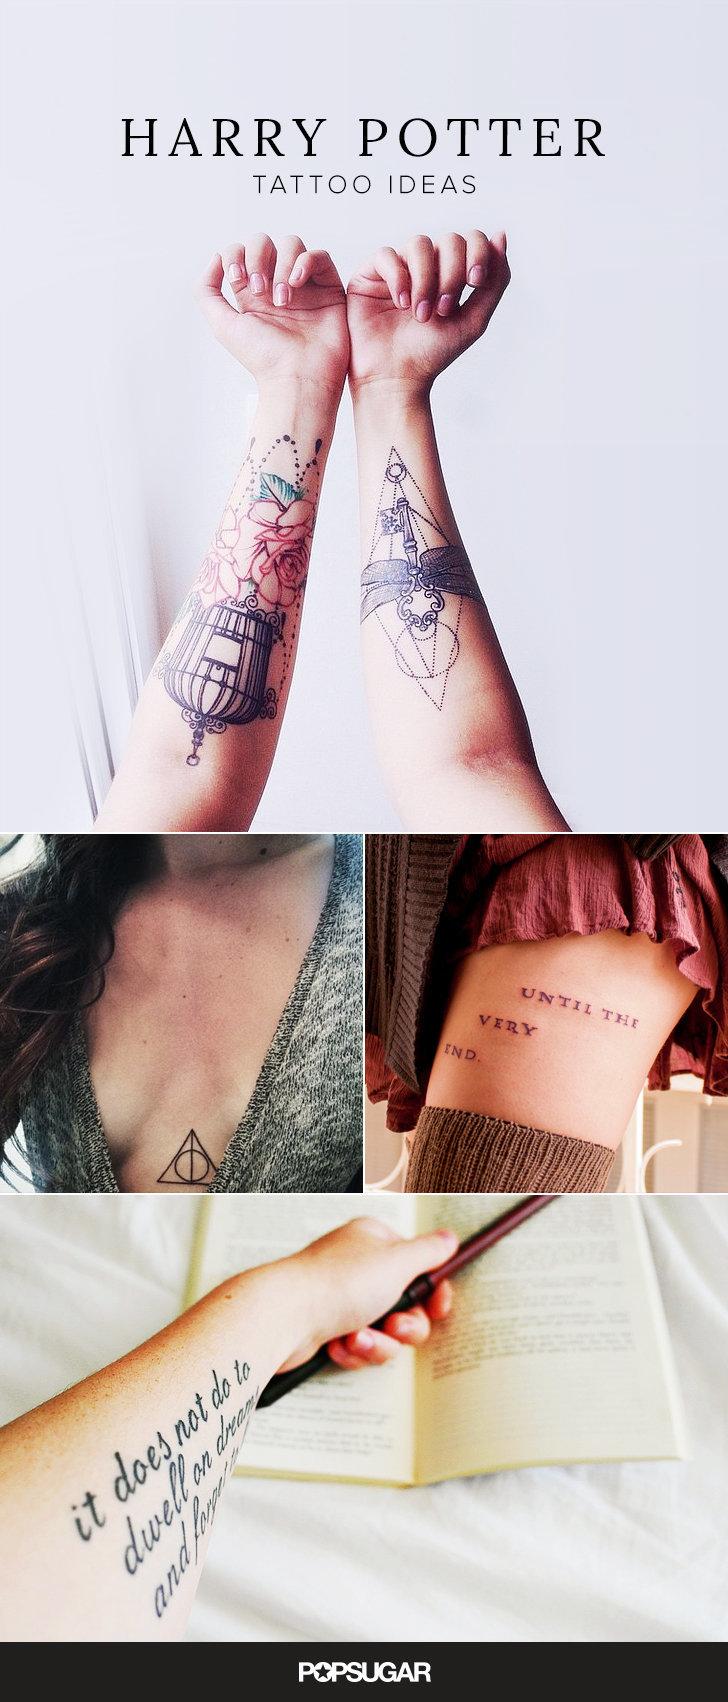 Harry potter tattoos that would make j k rowling proud original